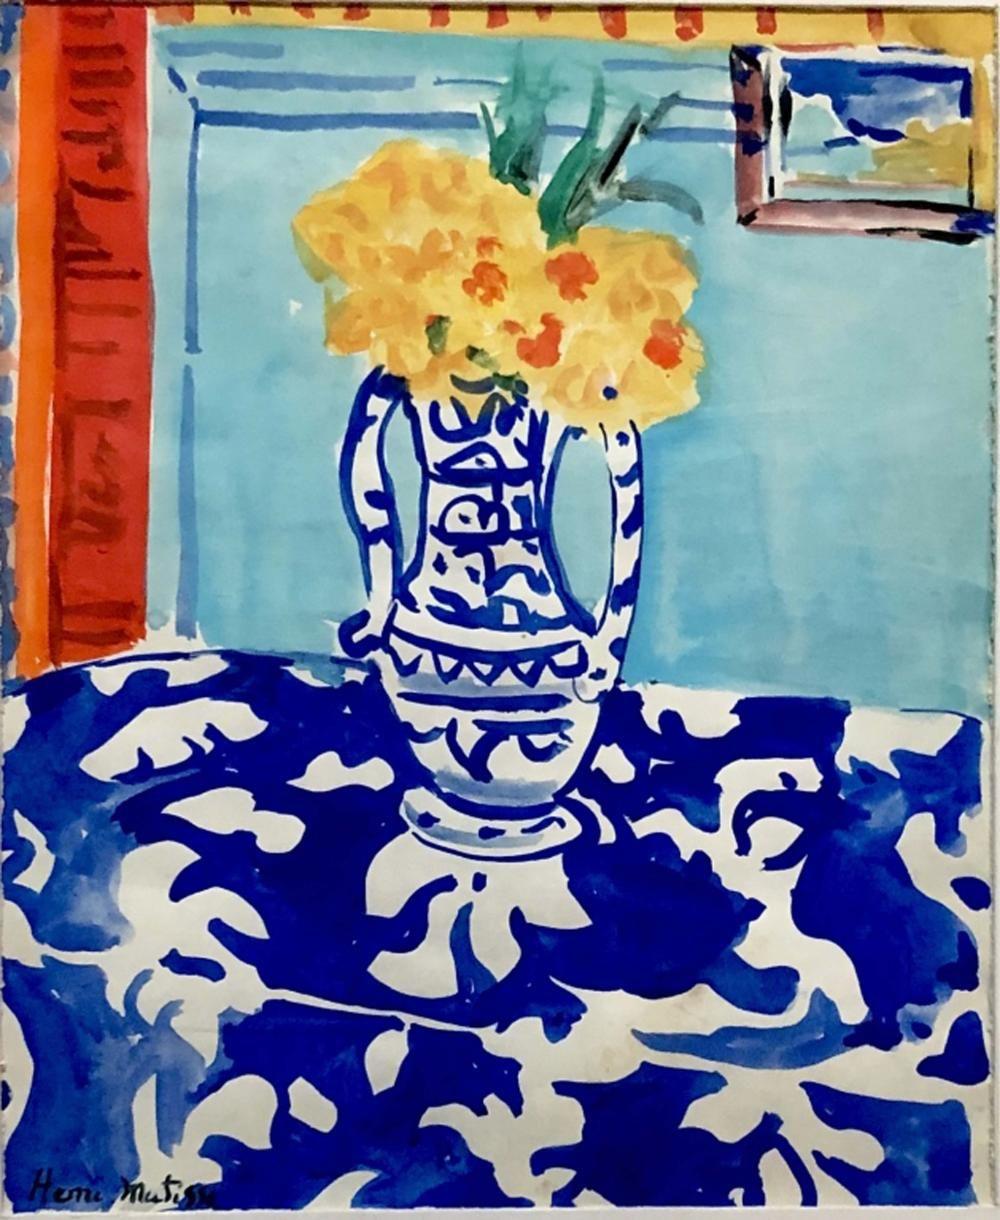 HENRI MATISSE WATERCOLOR STILL LIFE | Matisse paintings, Henri matisse,  Famous art paintings